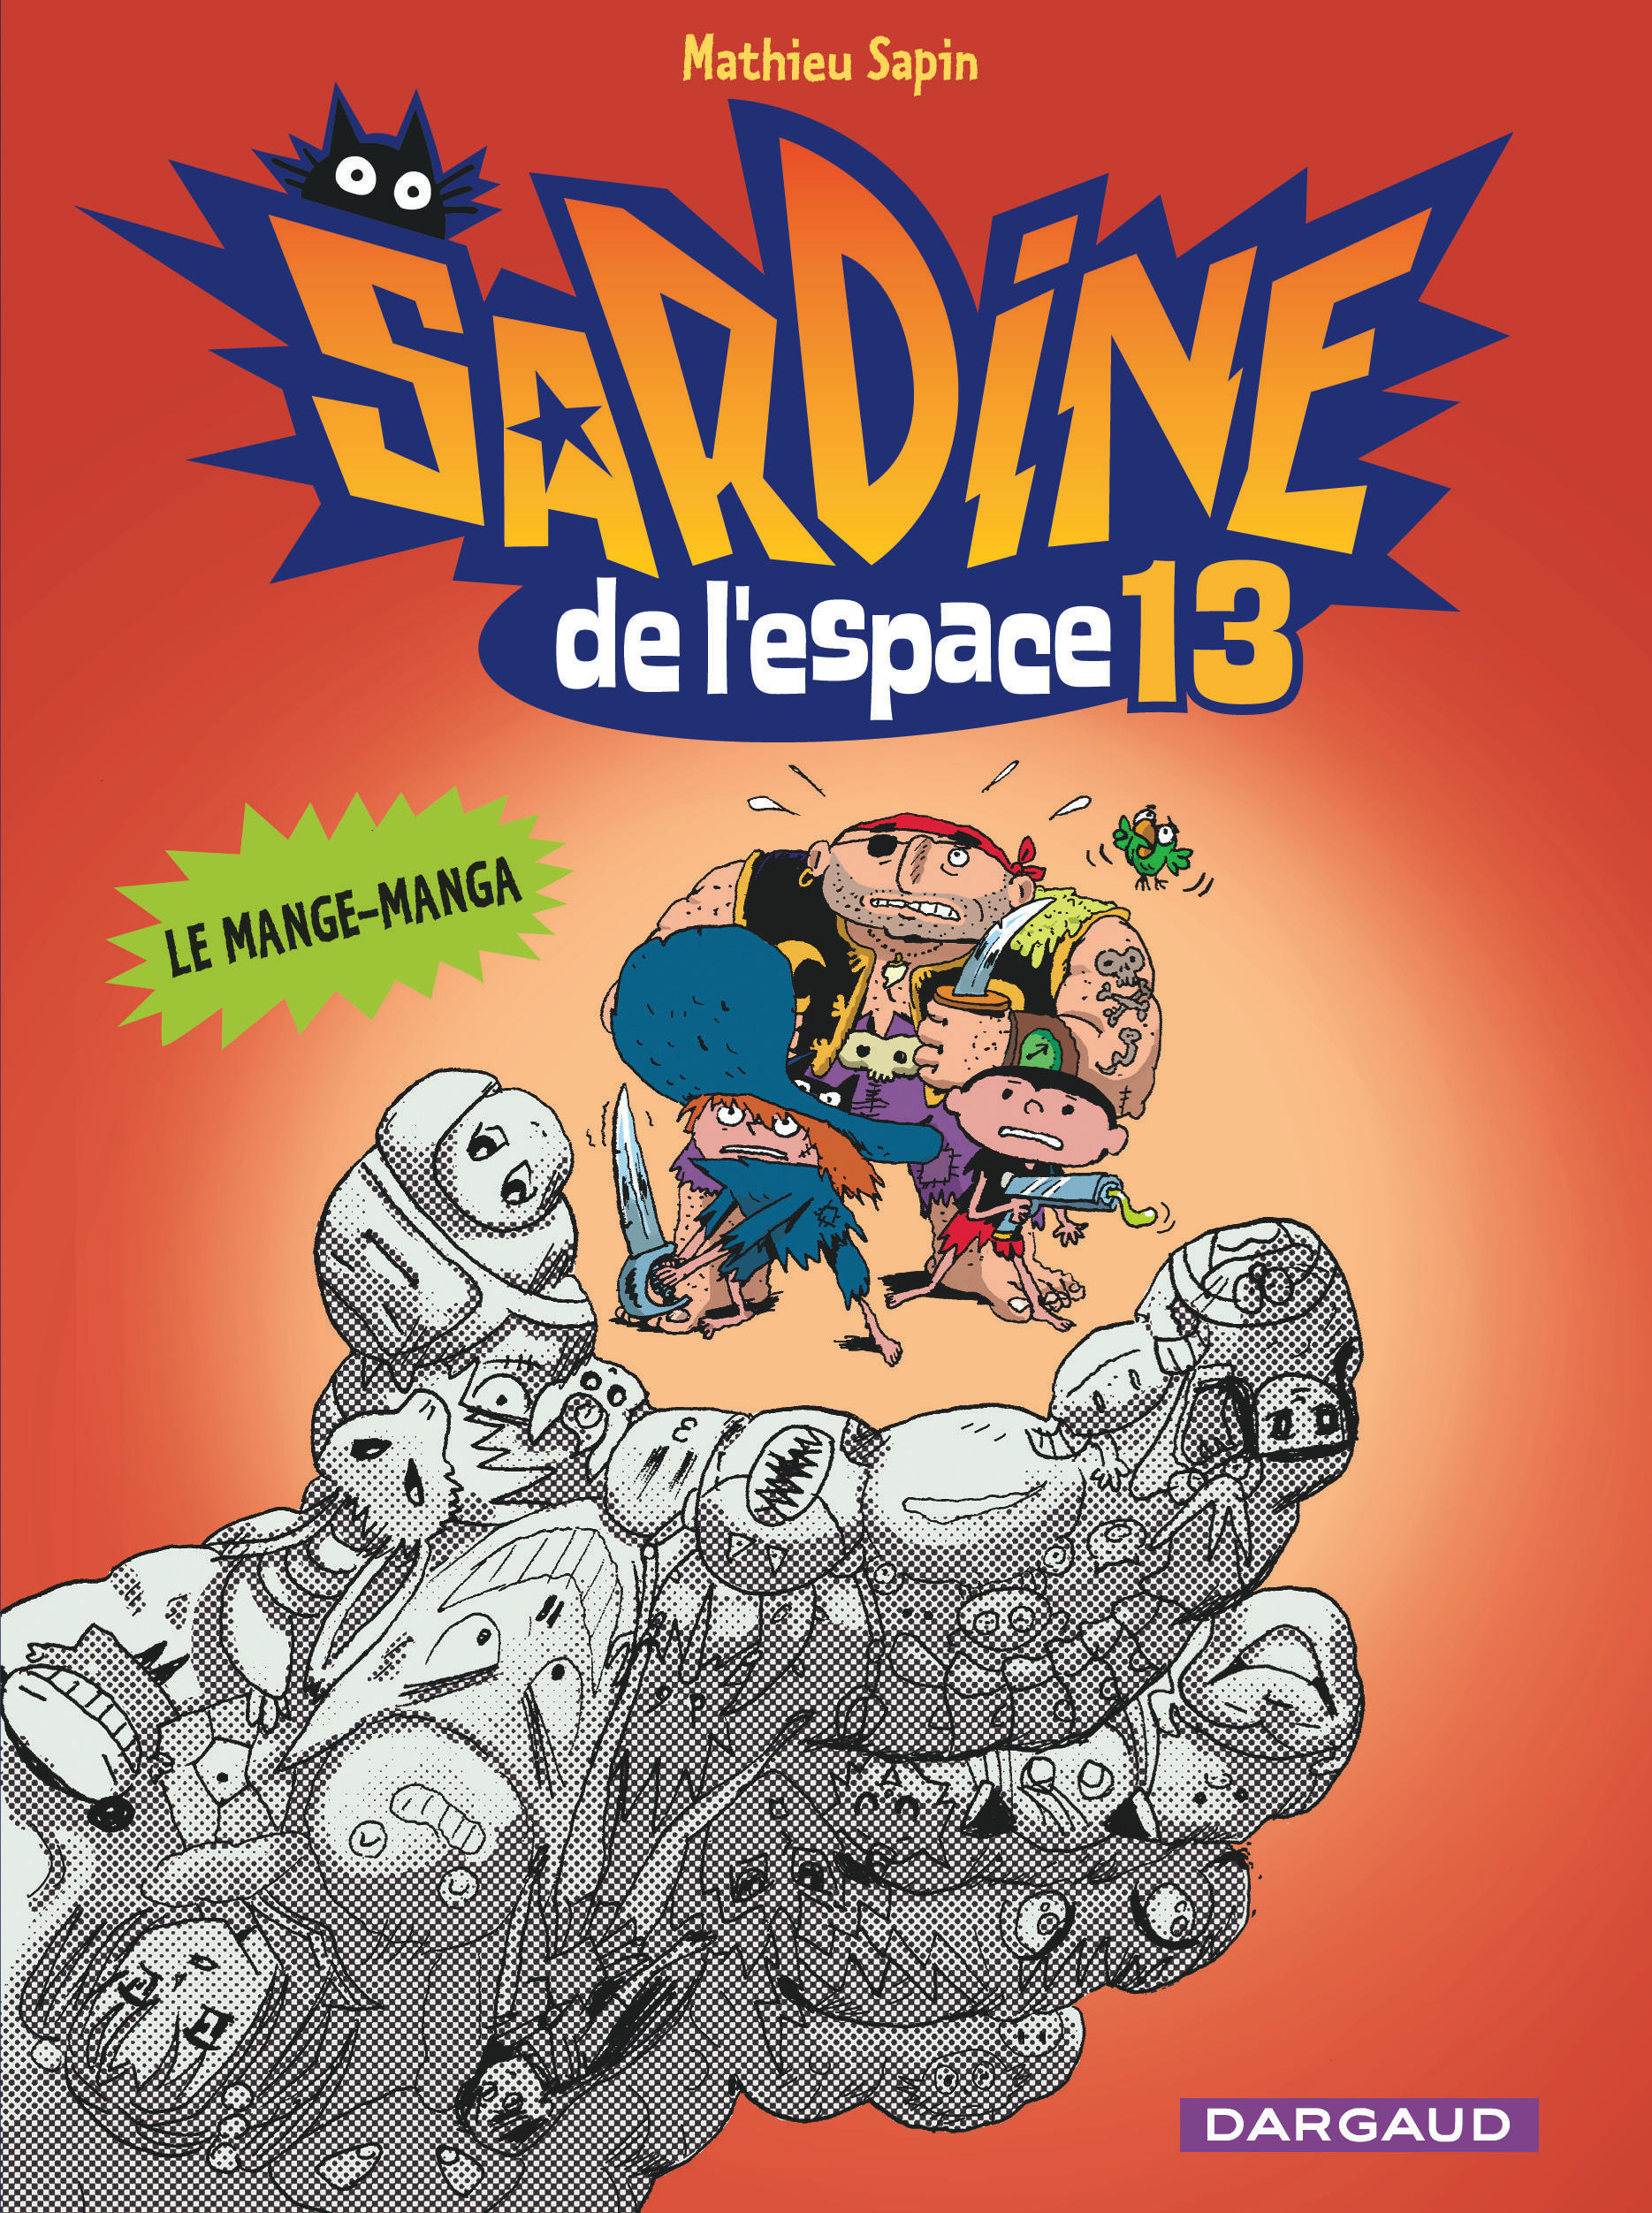 SARDINE DE L'ESPACE - TOME 13 - MANGE-MANGA (LE)